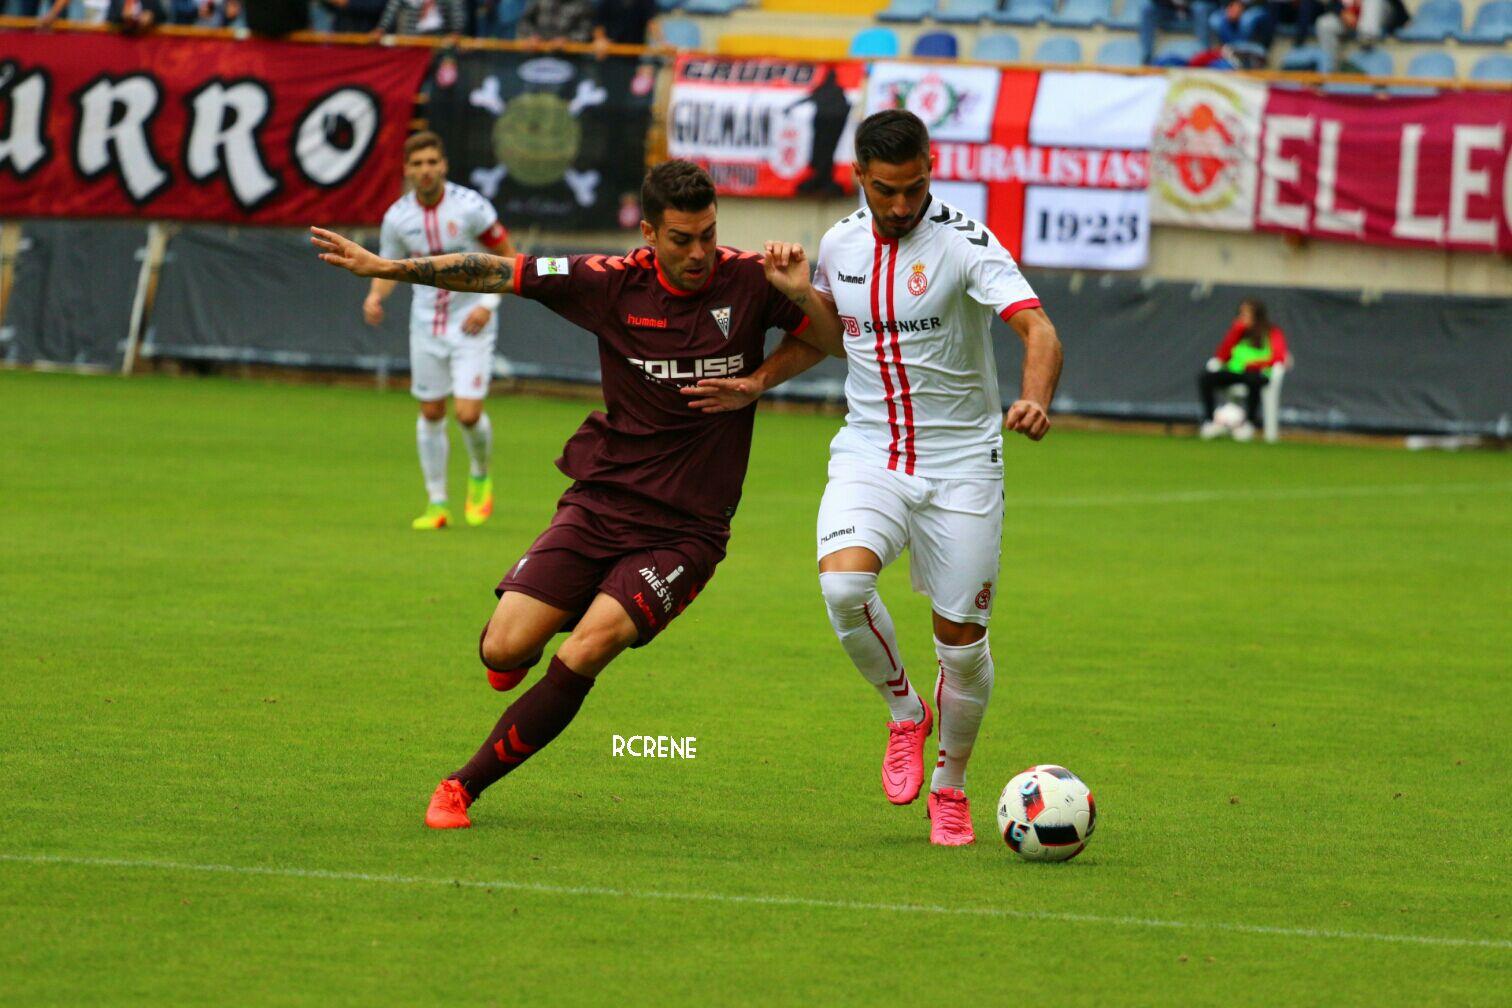 Kèo nhà cái Lugo vs Albacete